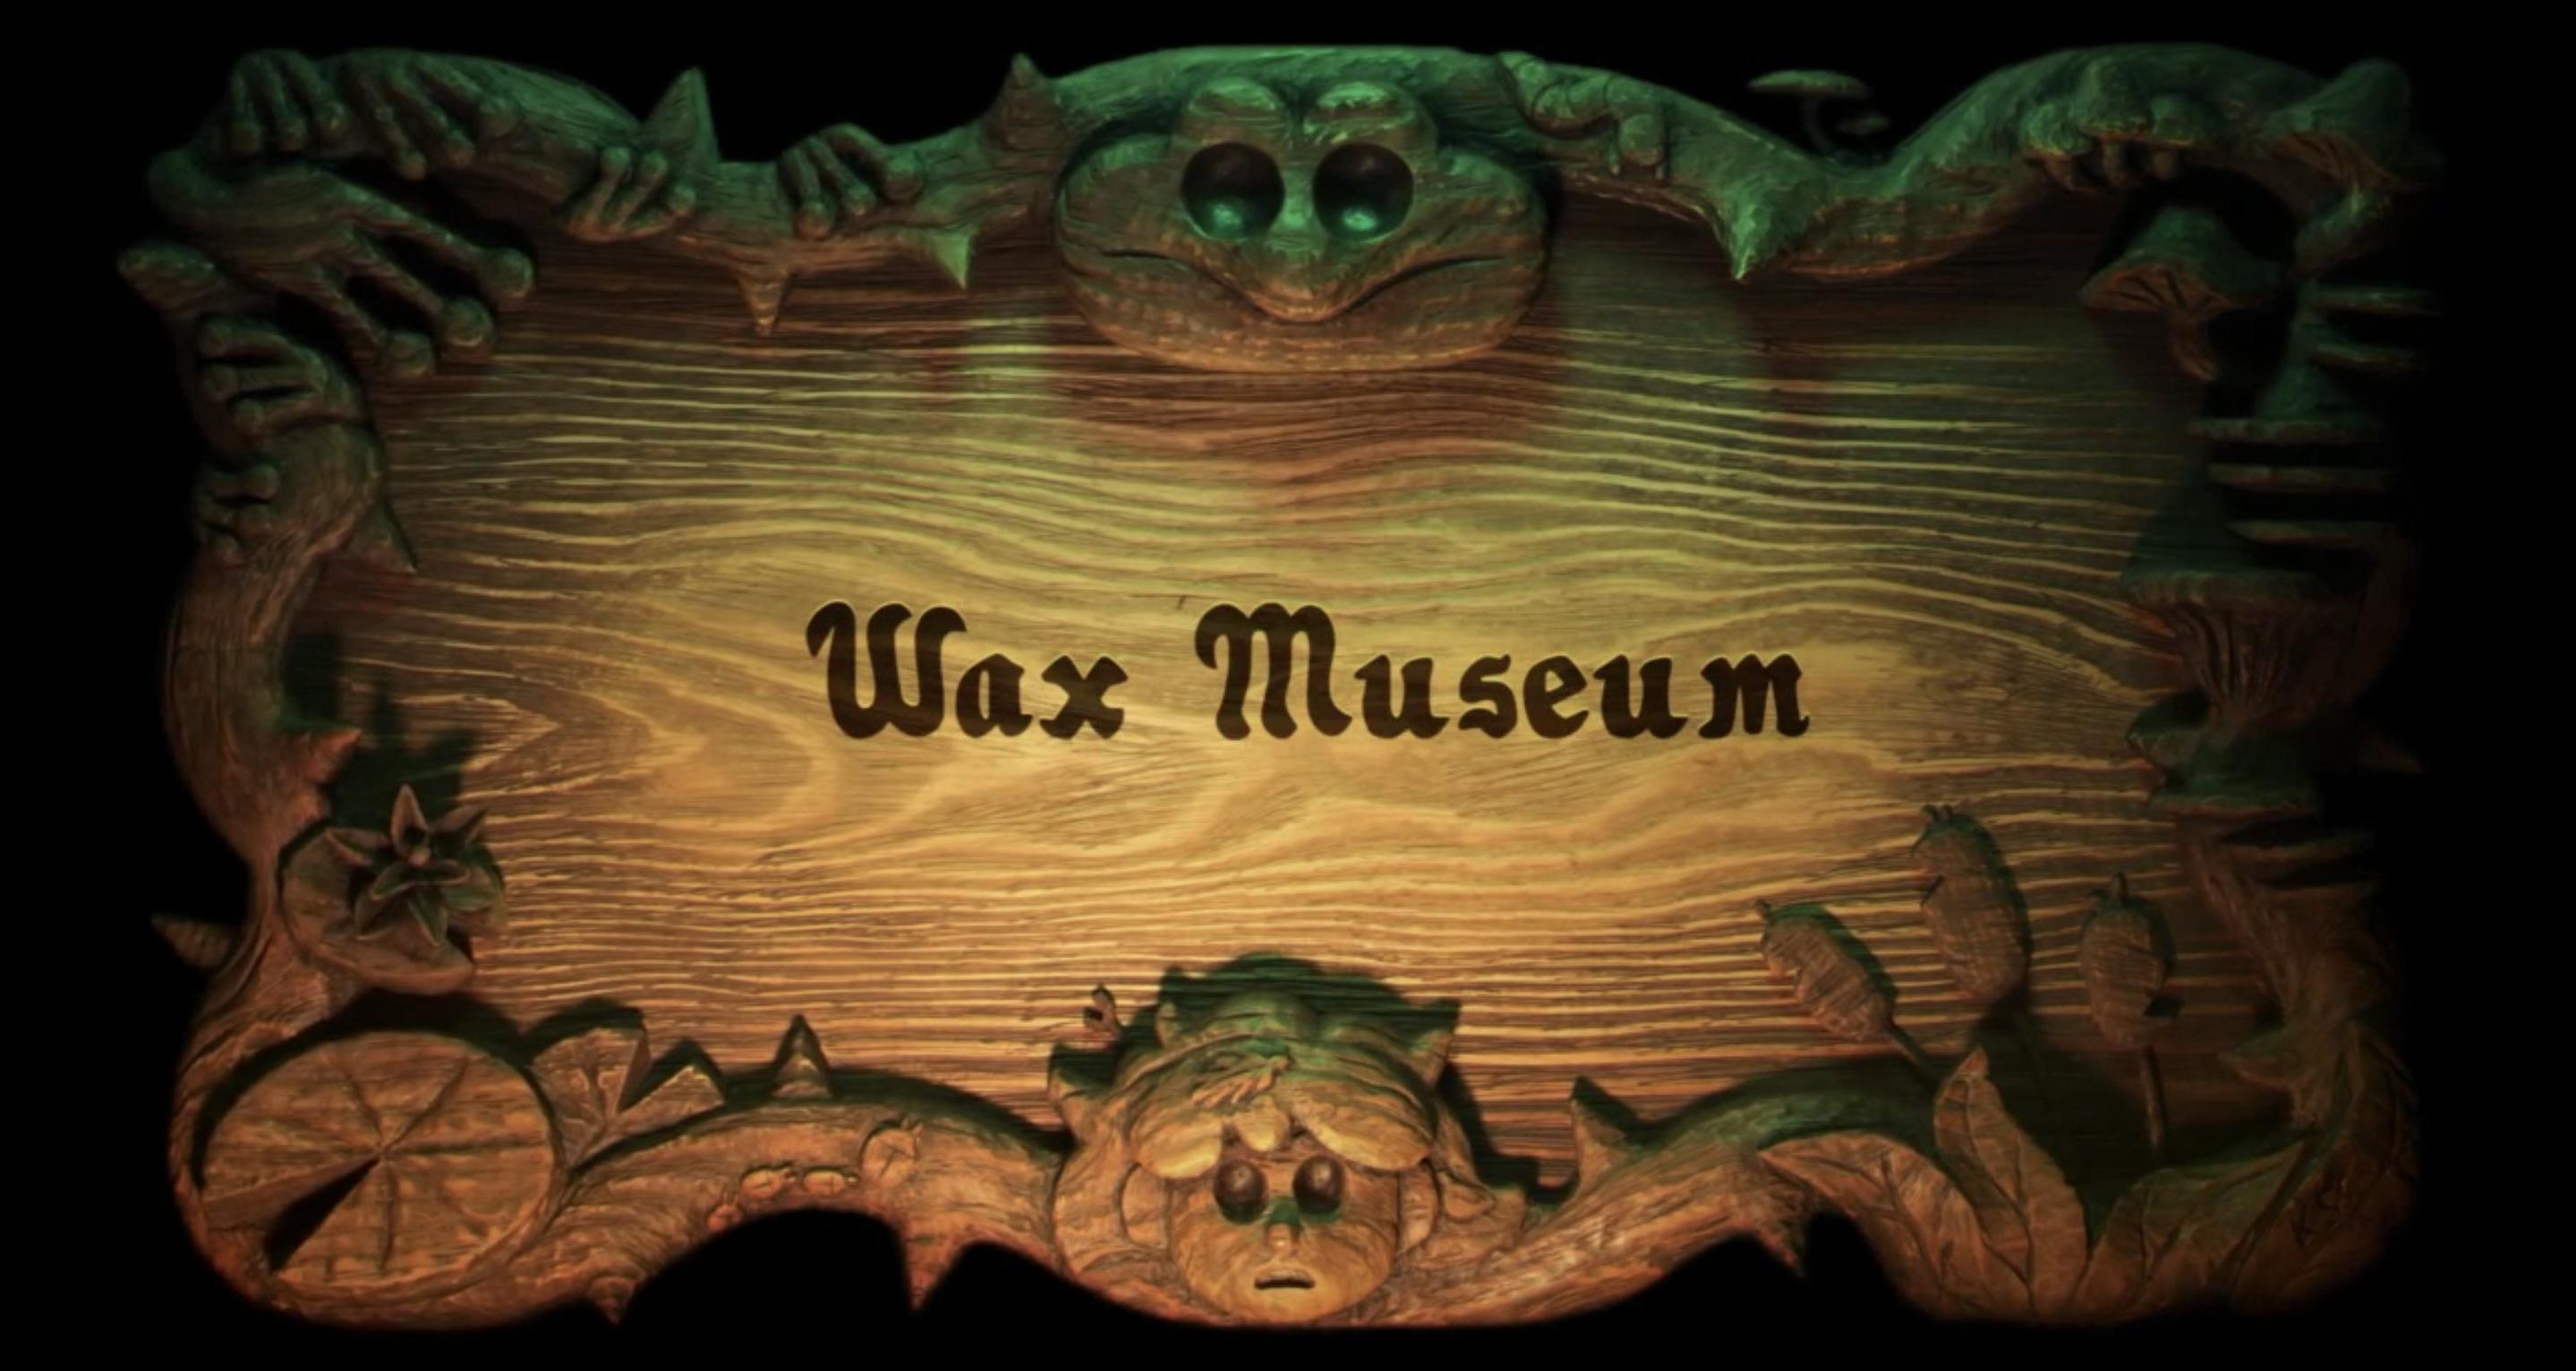 Wax Museum.png